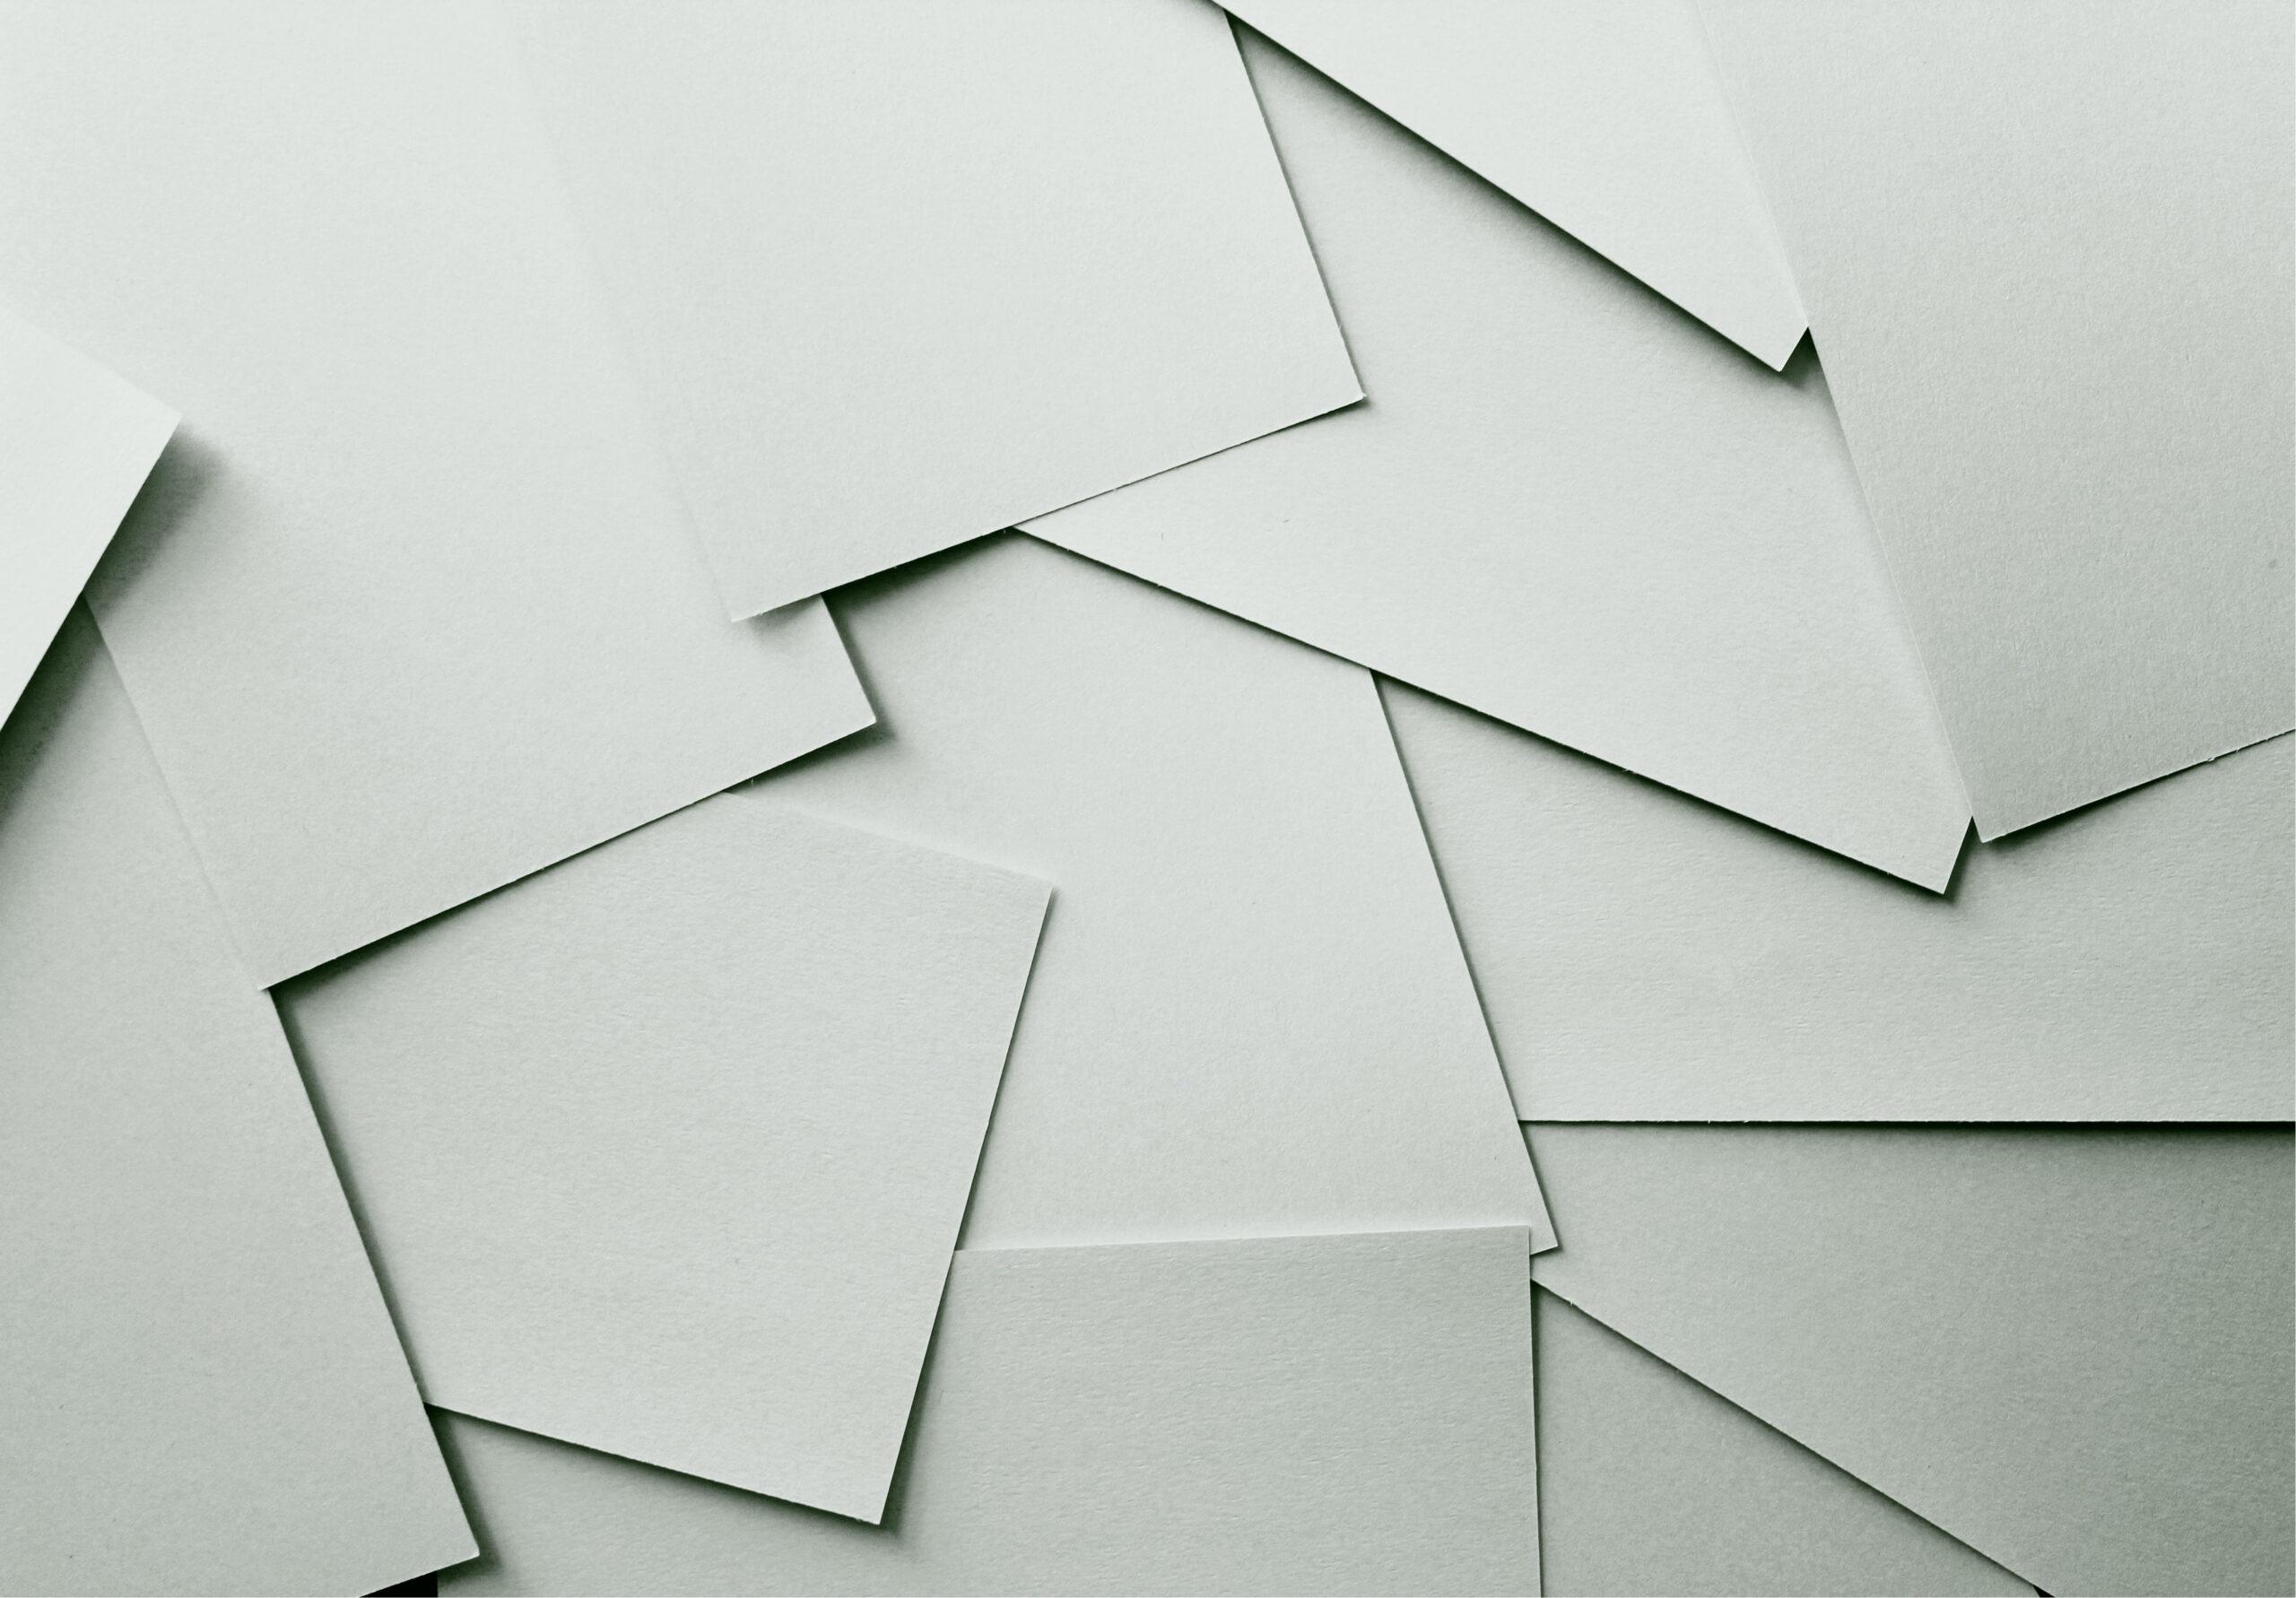 Nova Druck Recyclingpapiere